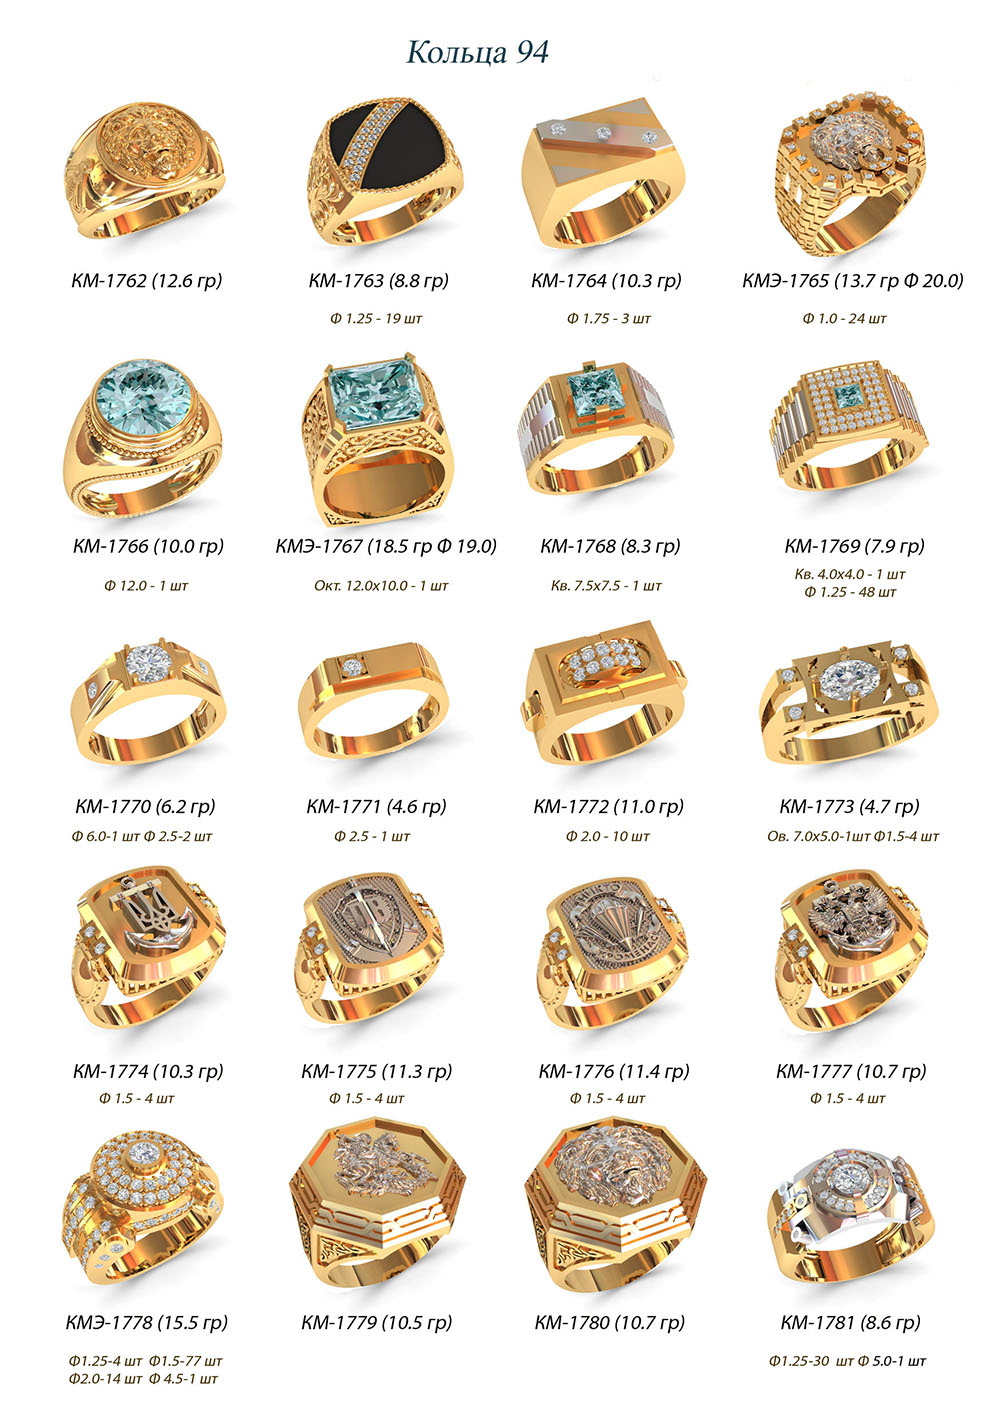 modelit-wax-models-ring-94